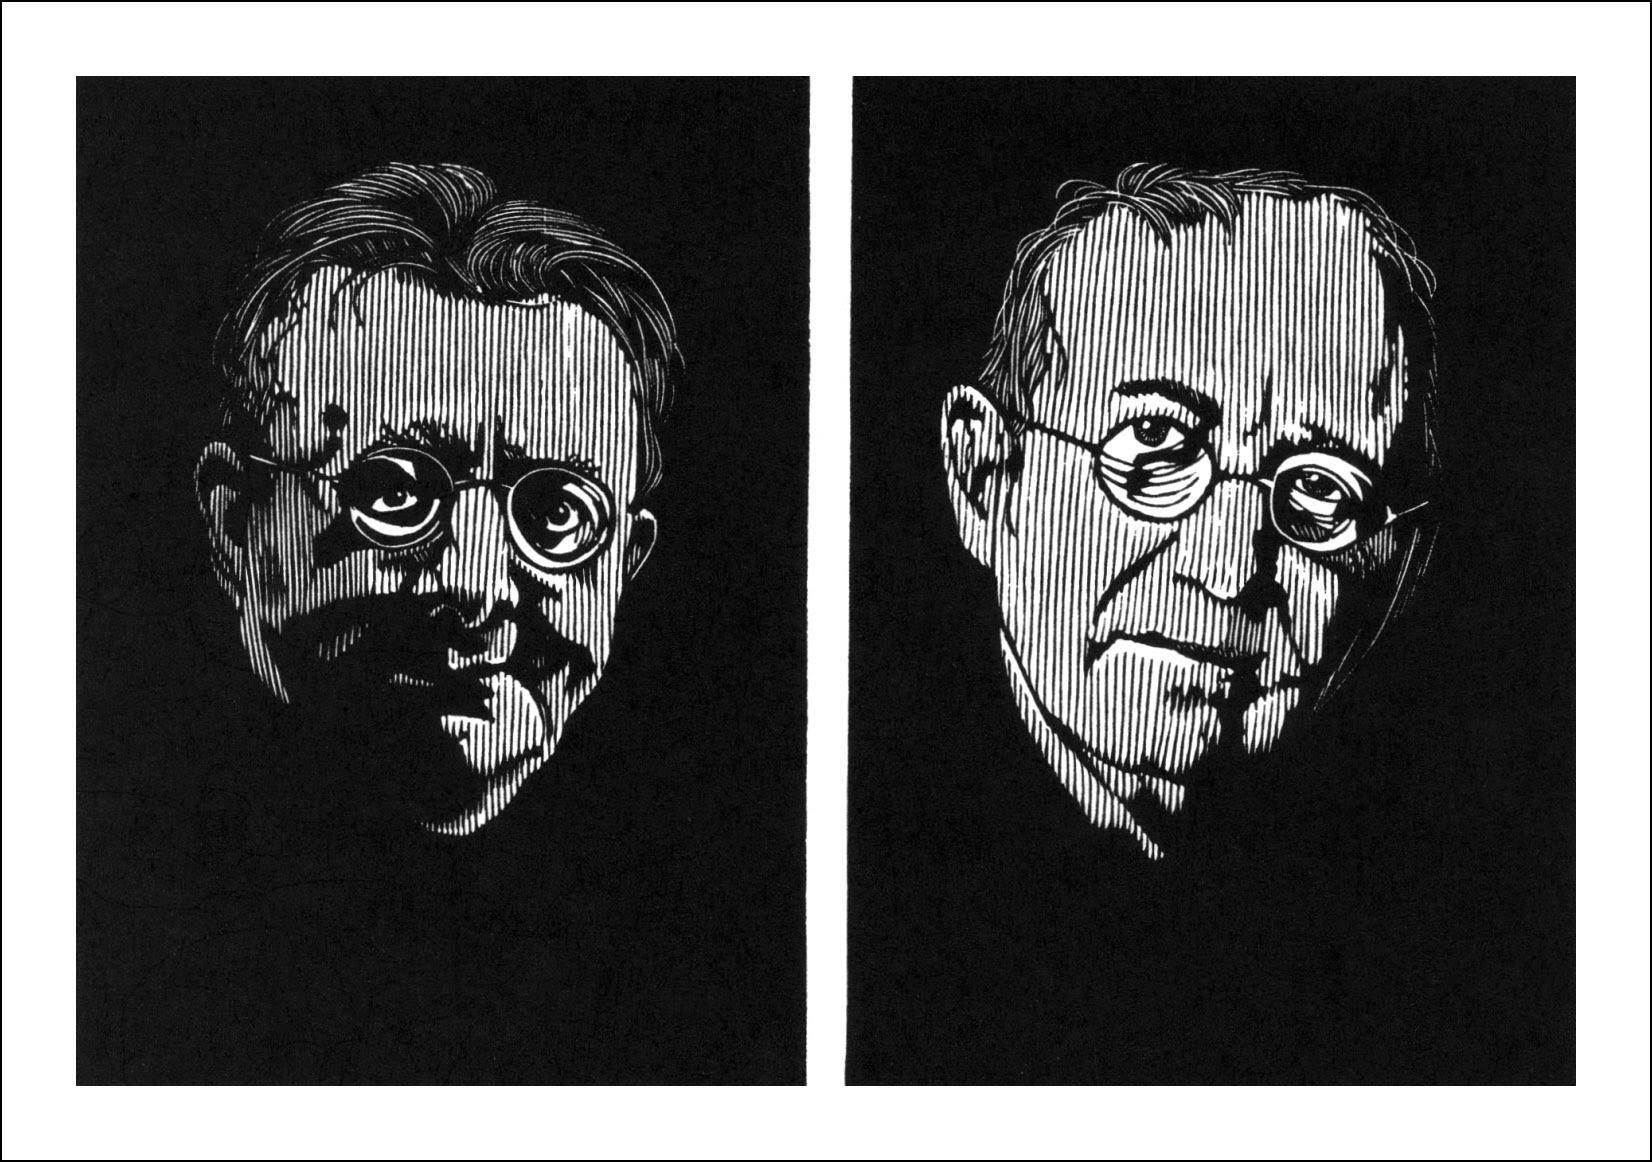 Barry Moser, Frankenstein